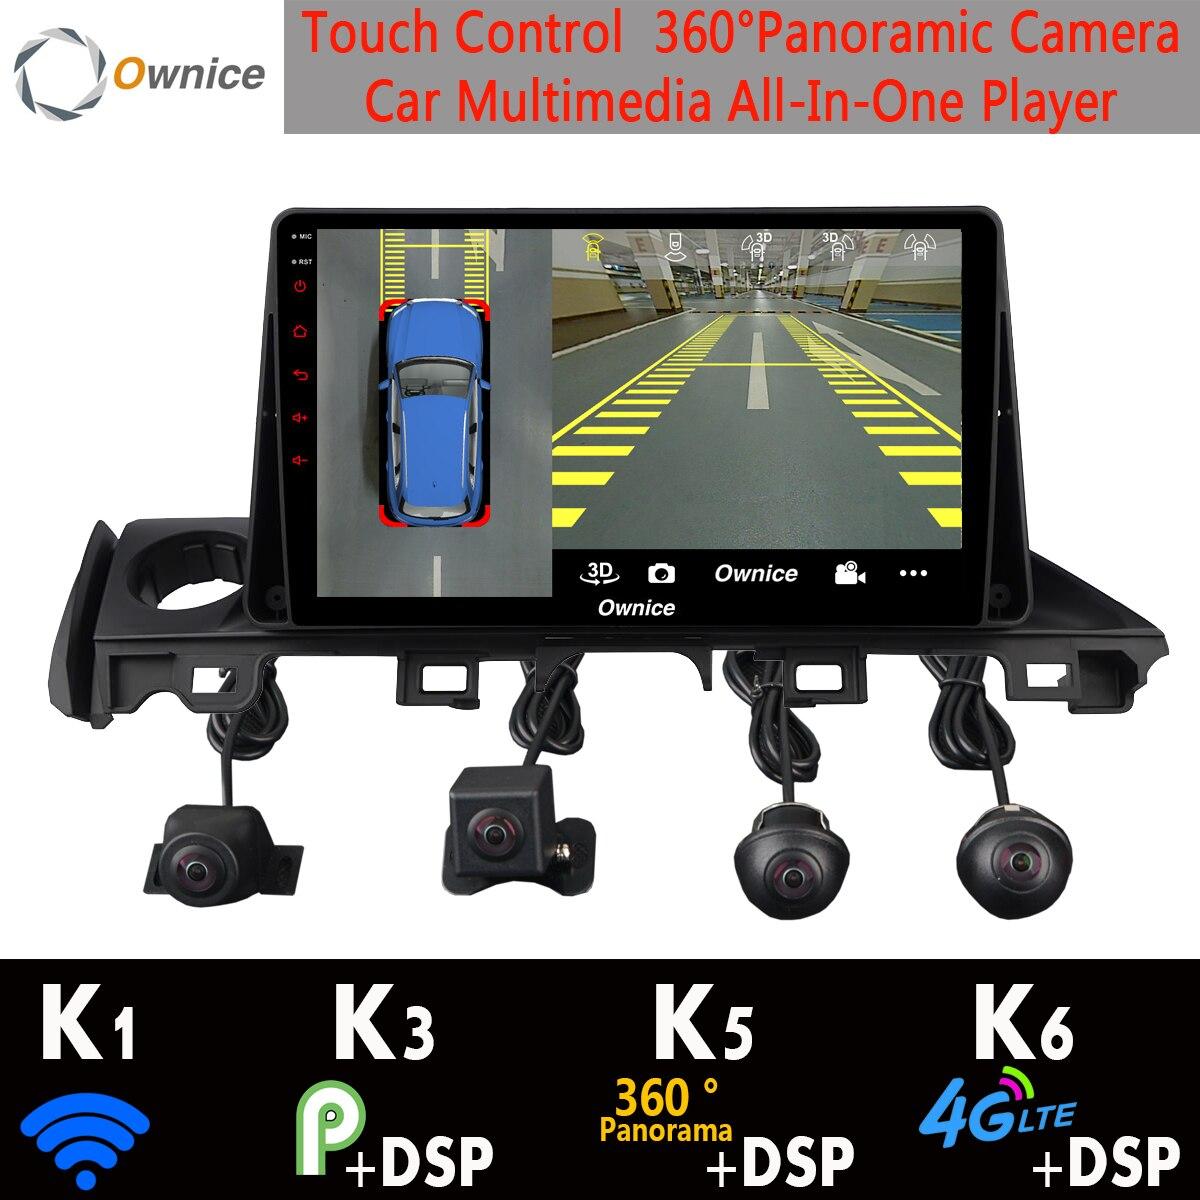 1Din 360 ° Panorâmica Android 9.0 Núcleo 4 + 64 8G Car Multimedia Player GPS Rádio DSP CarPlay para mazda Atenza 6 Mazda6 2017 2018 2019